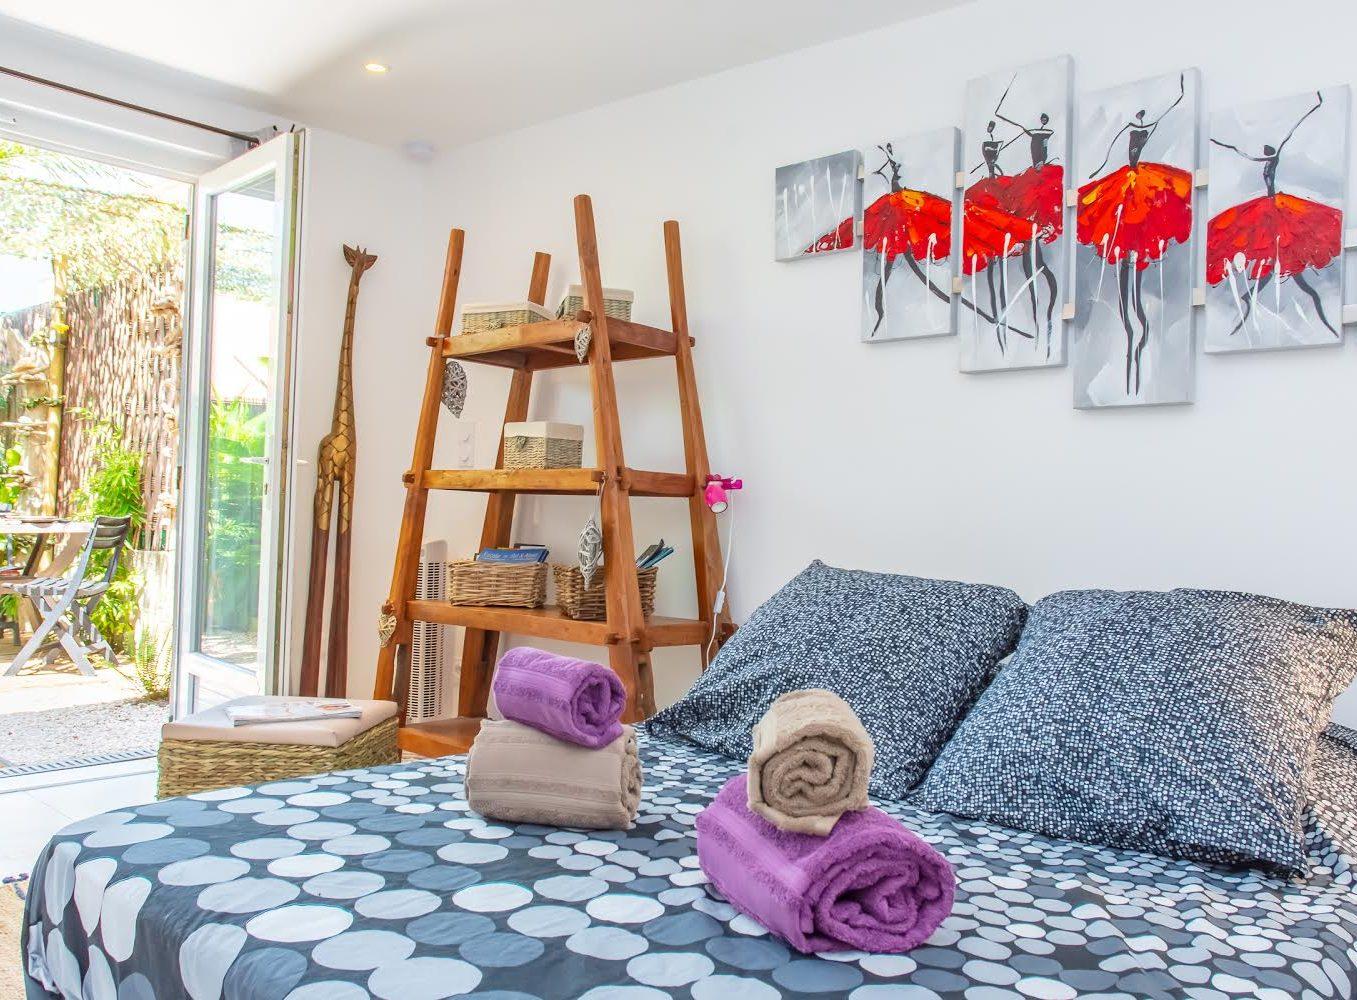 Location appartement giens hyères chambre d'hote mahinui piece